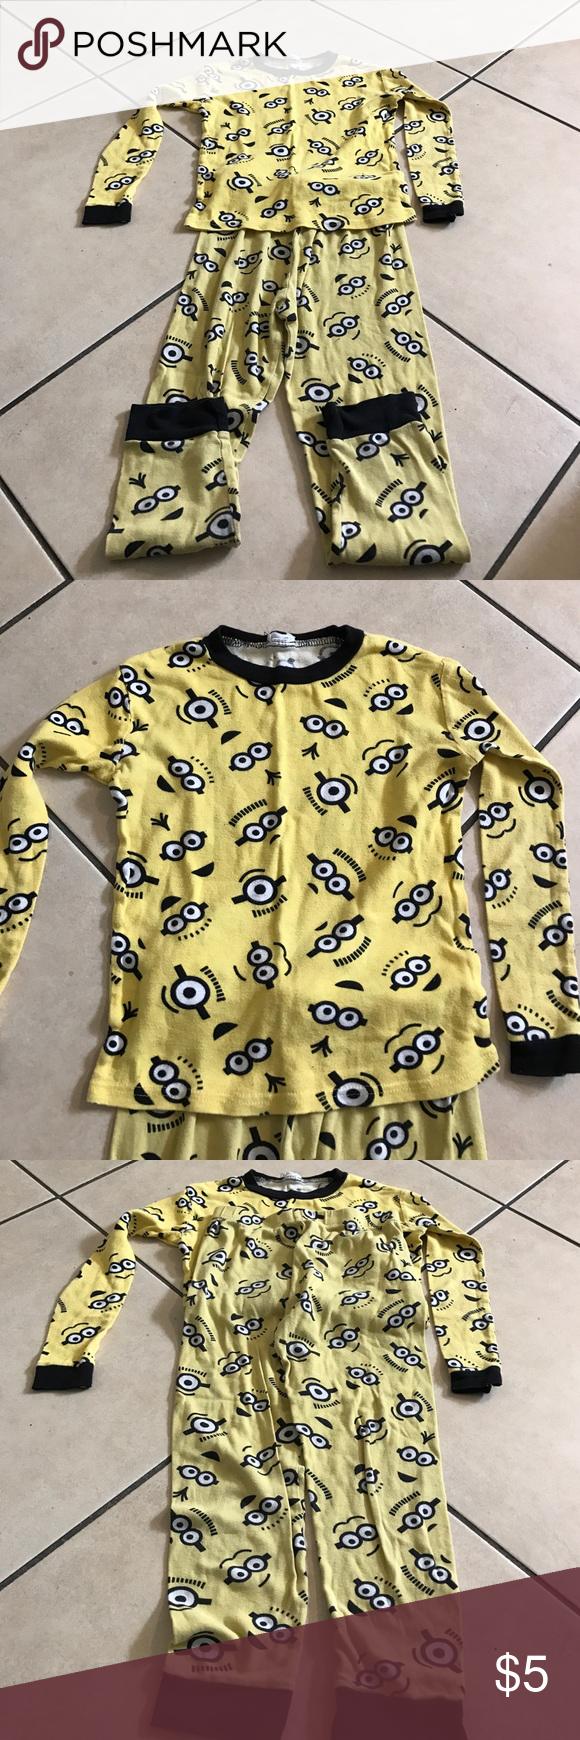 Minion pjs for boys 6/8 yrs Bundle and offer minions Pajamas